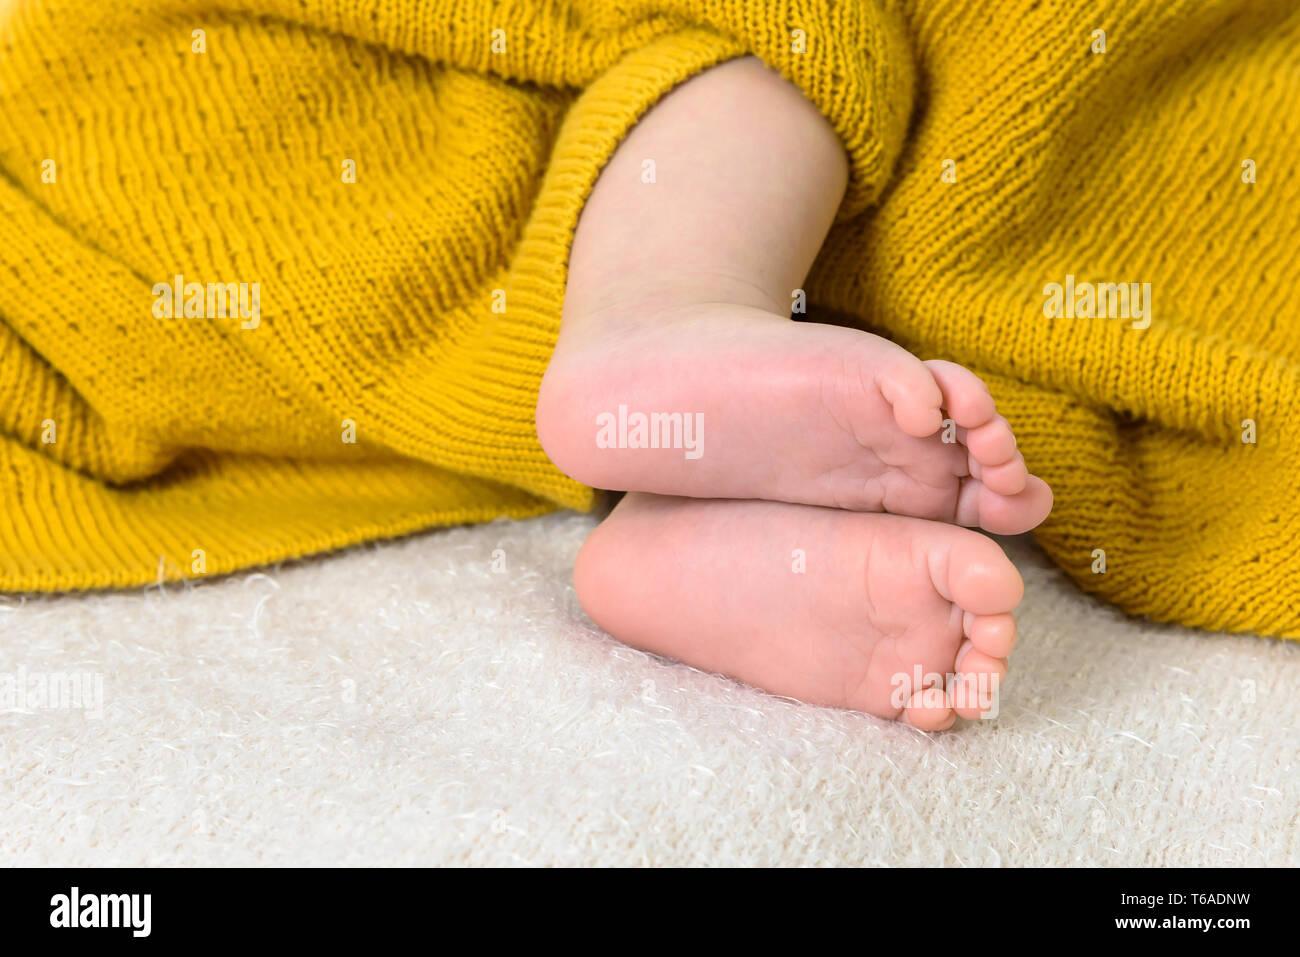 Close up of newborn baby feet on soft blanket - Stock Image